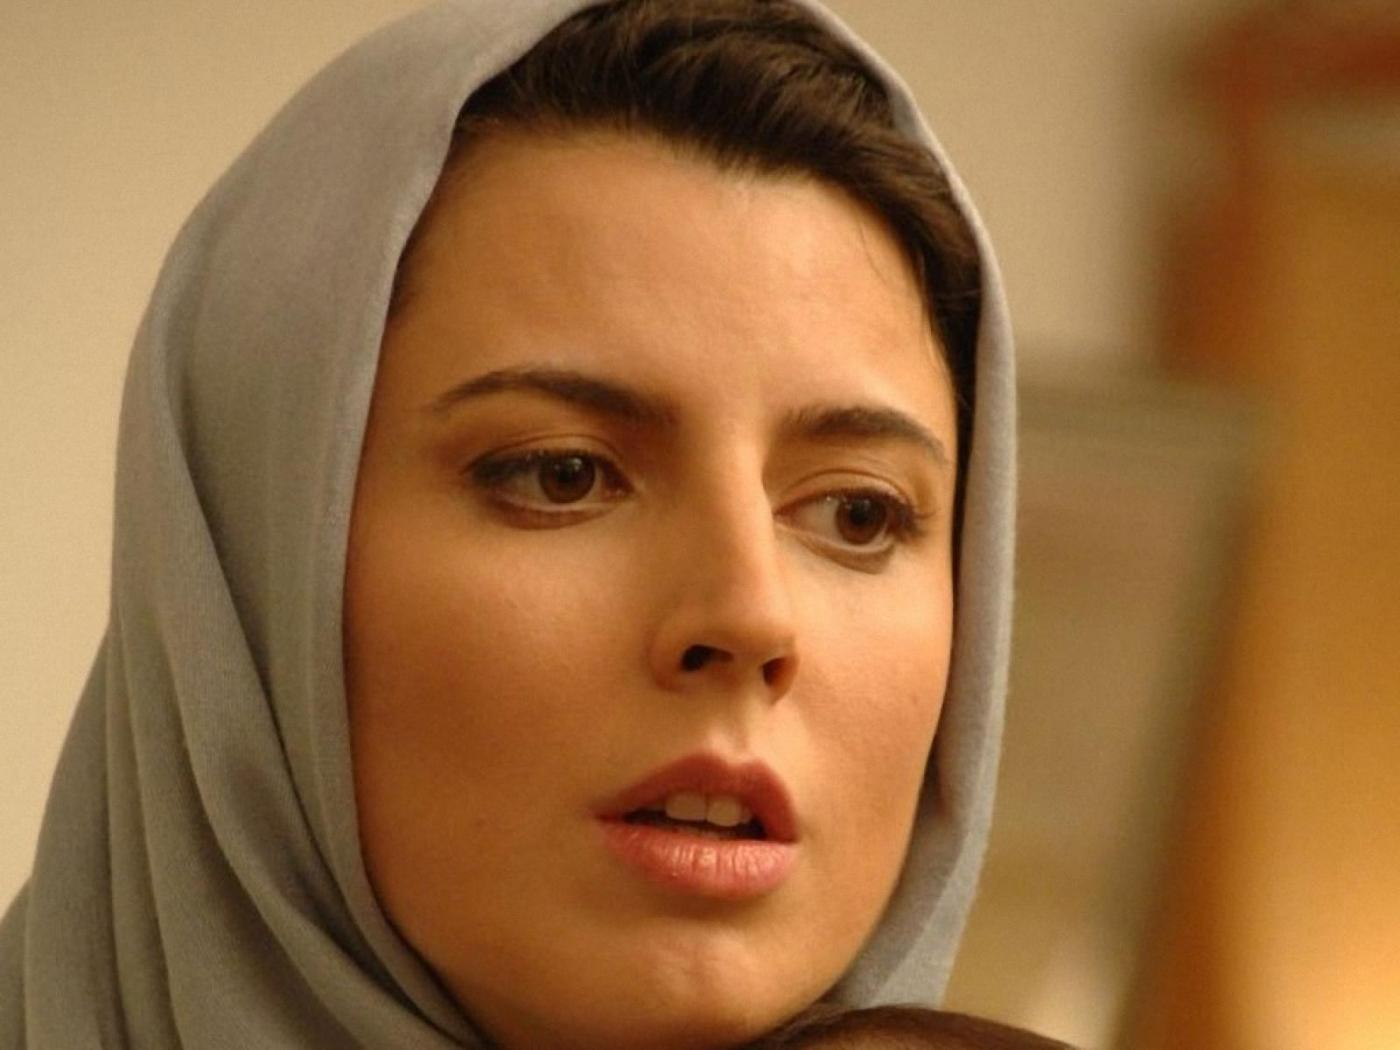 بالصور جمال ايرانيات , خلفيات بنات ايران الجميلات 3870 3